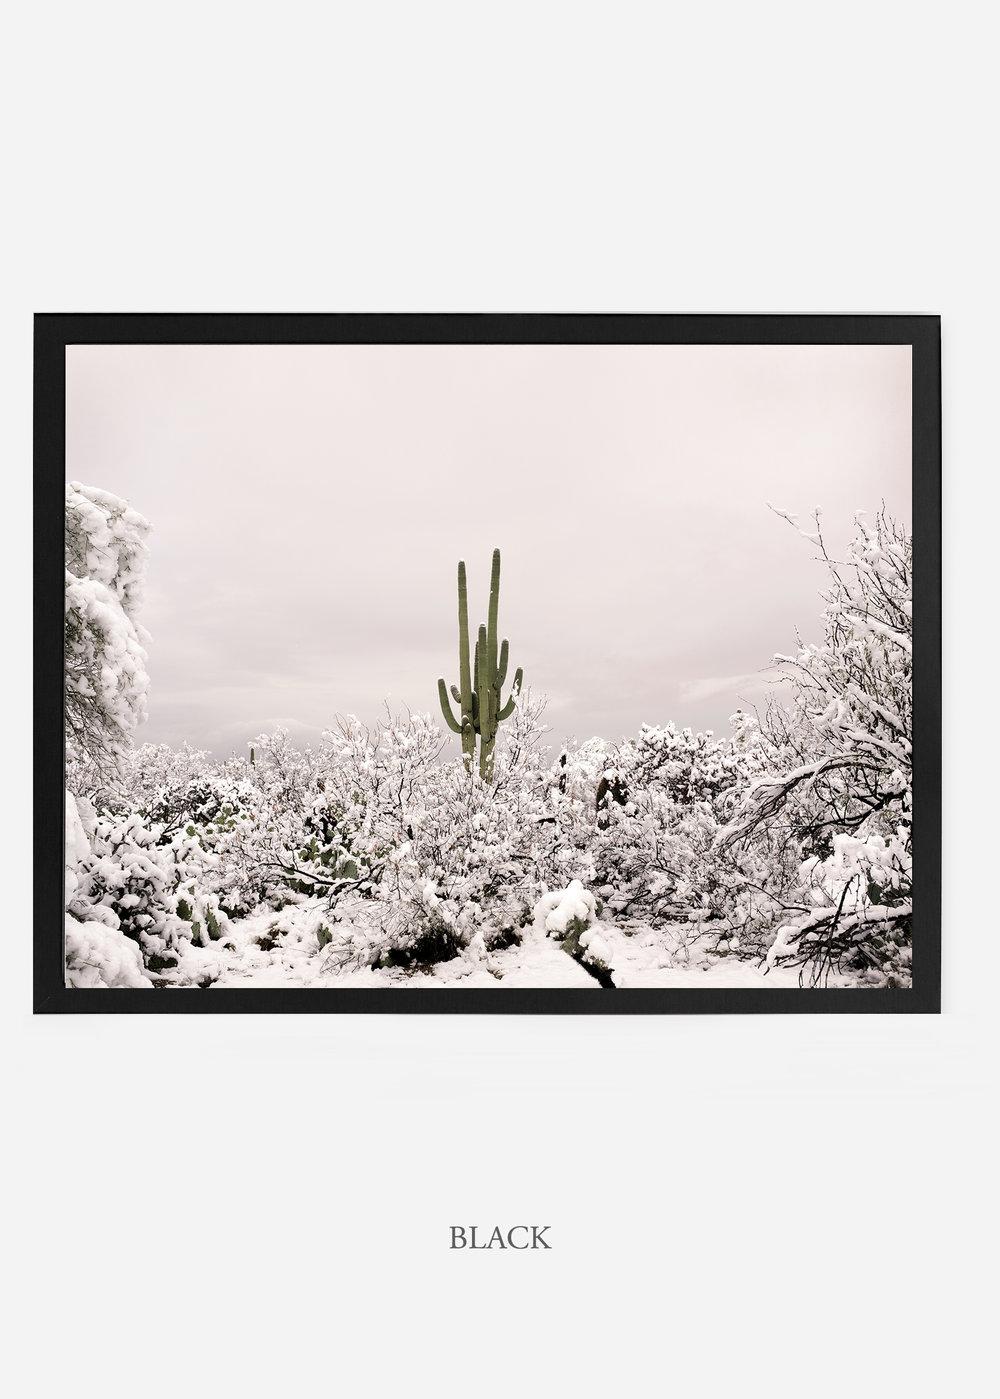 nomat_blackframe-saguaroNo.1-wildercalifornia-art-wallart-cactusprint-homedecor-prints-arizona-botanical-artwork-interiordesign.jpg